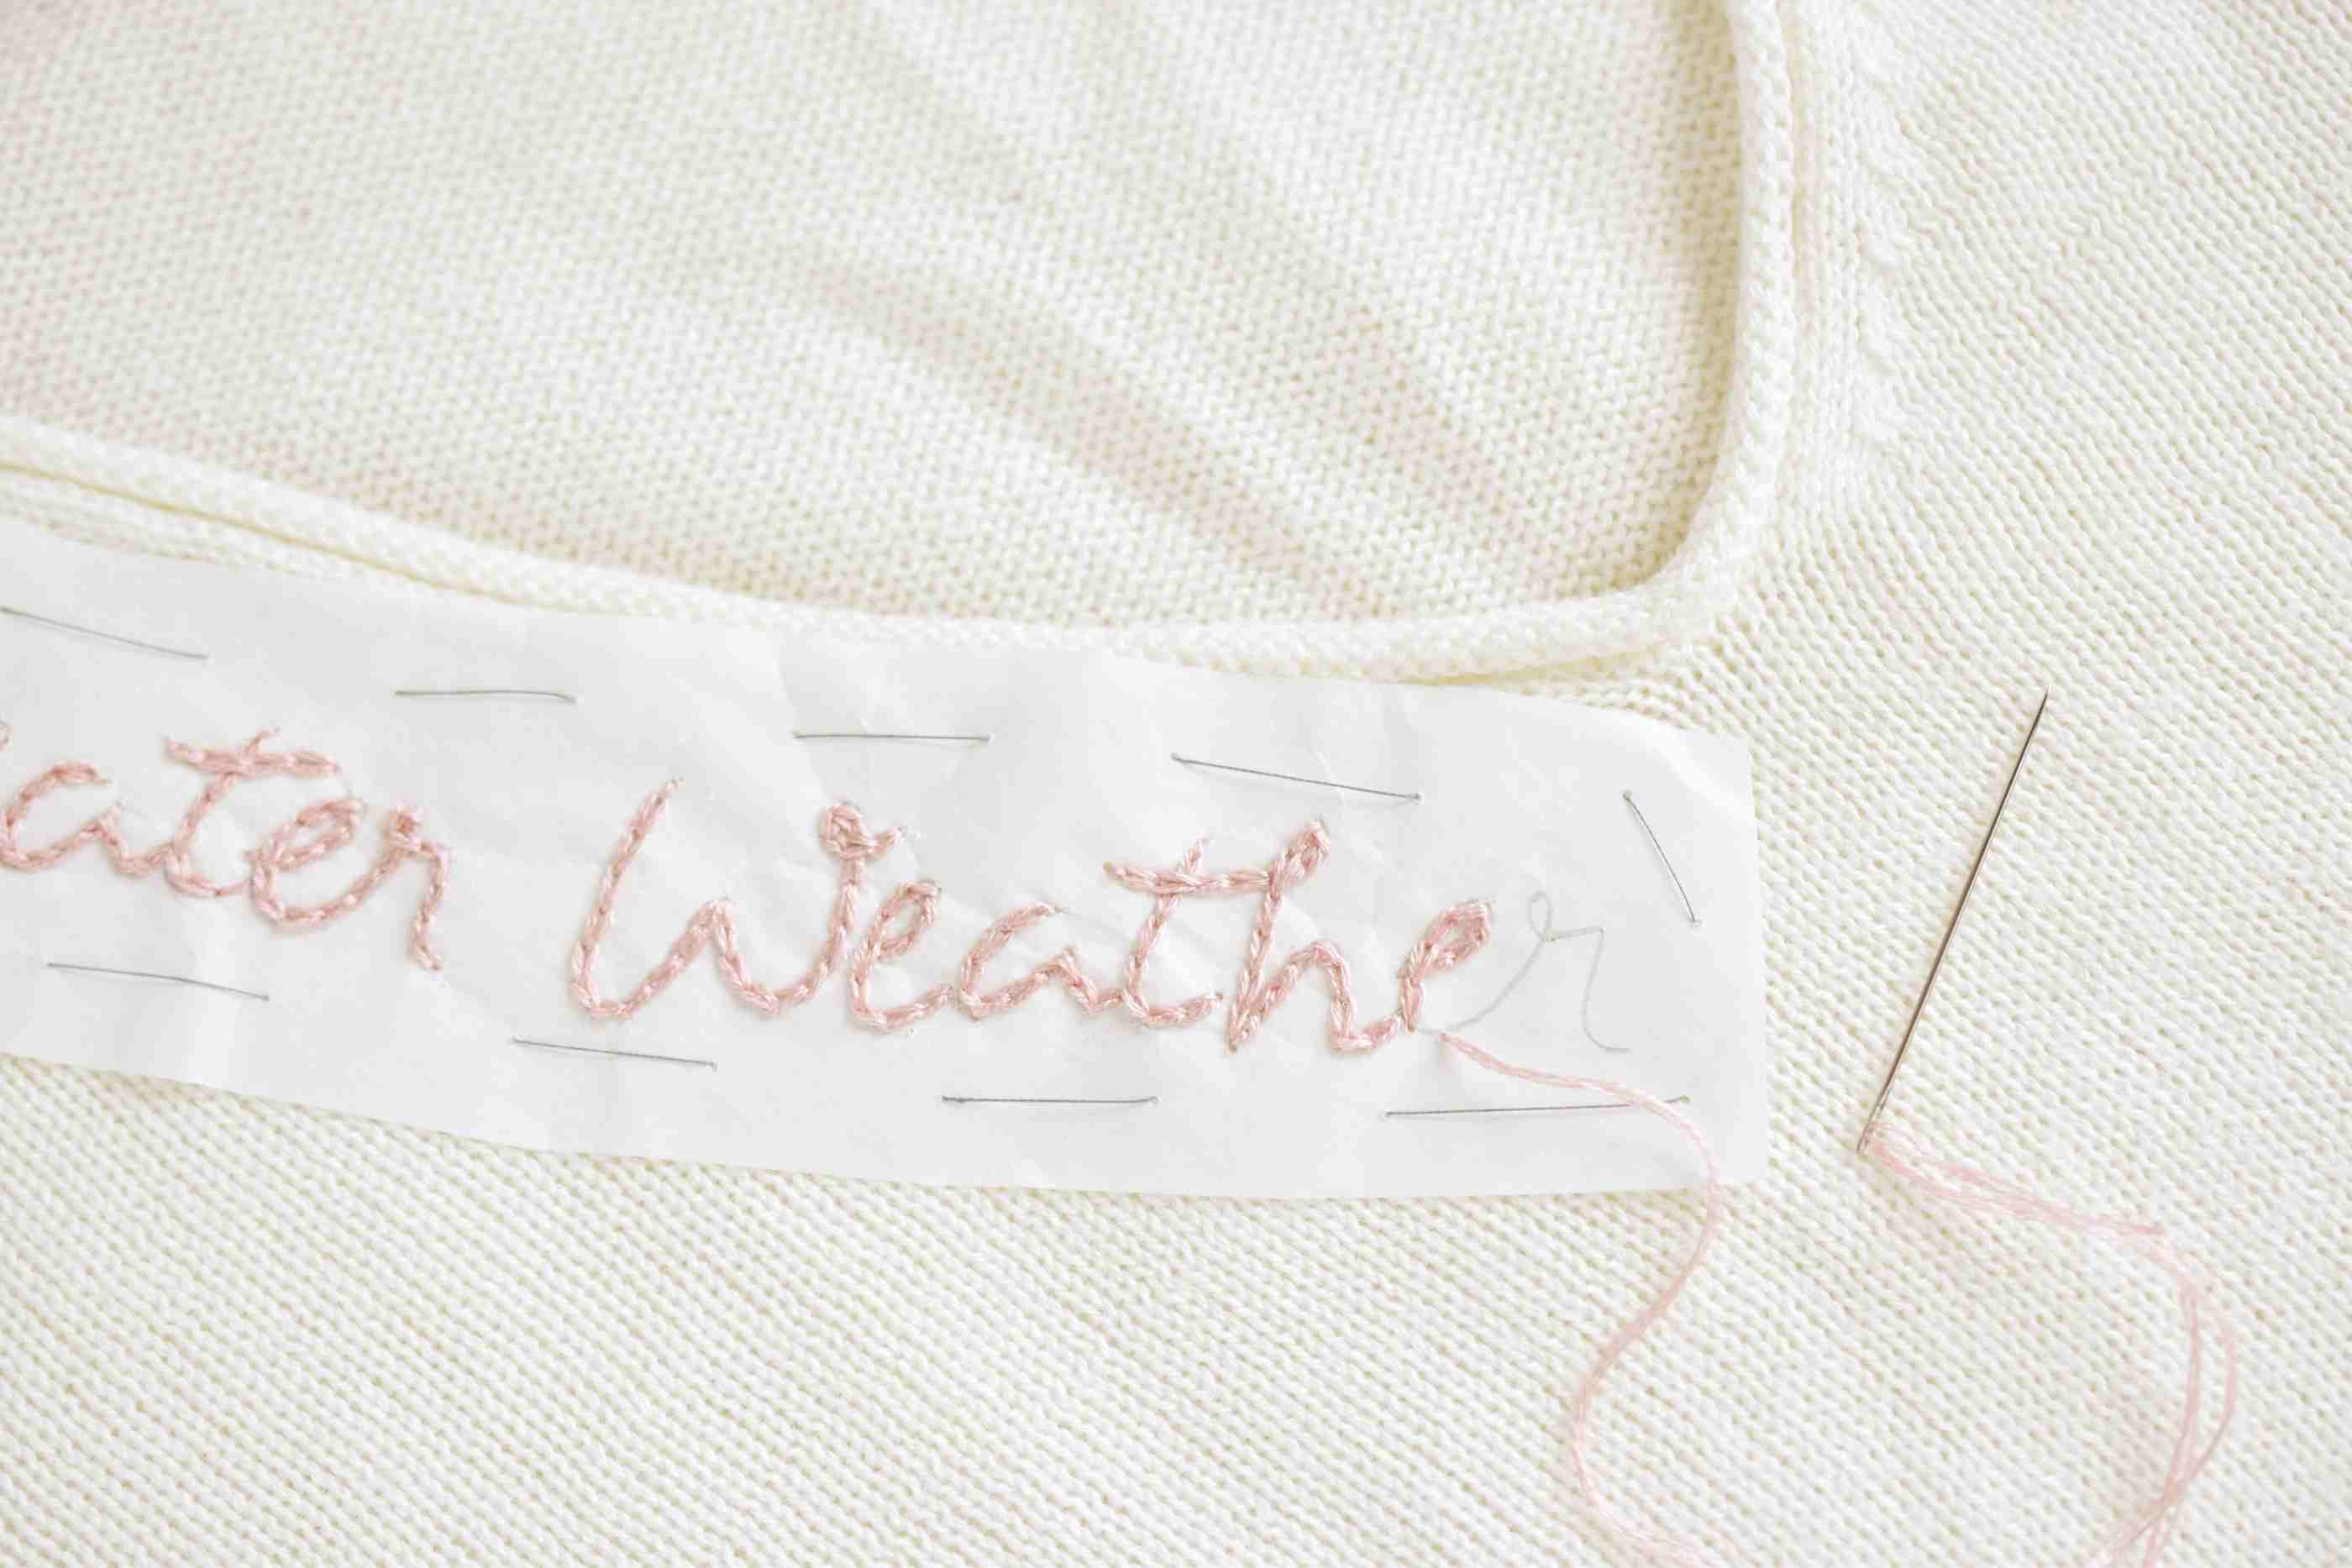 Stitching on the Sweater